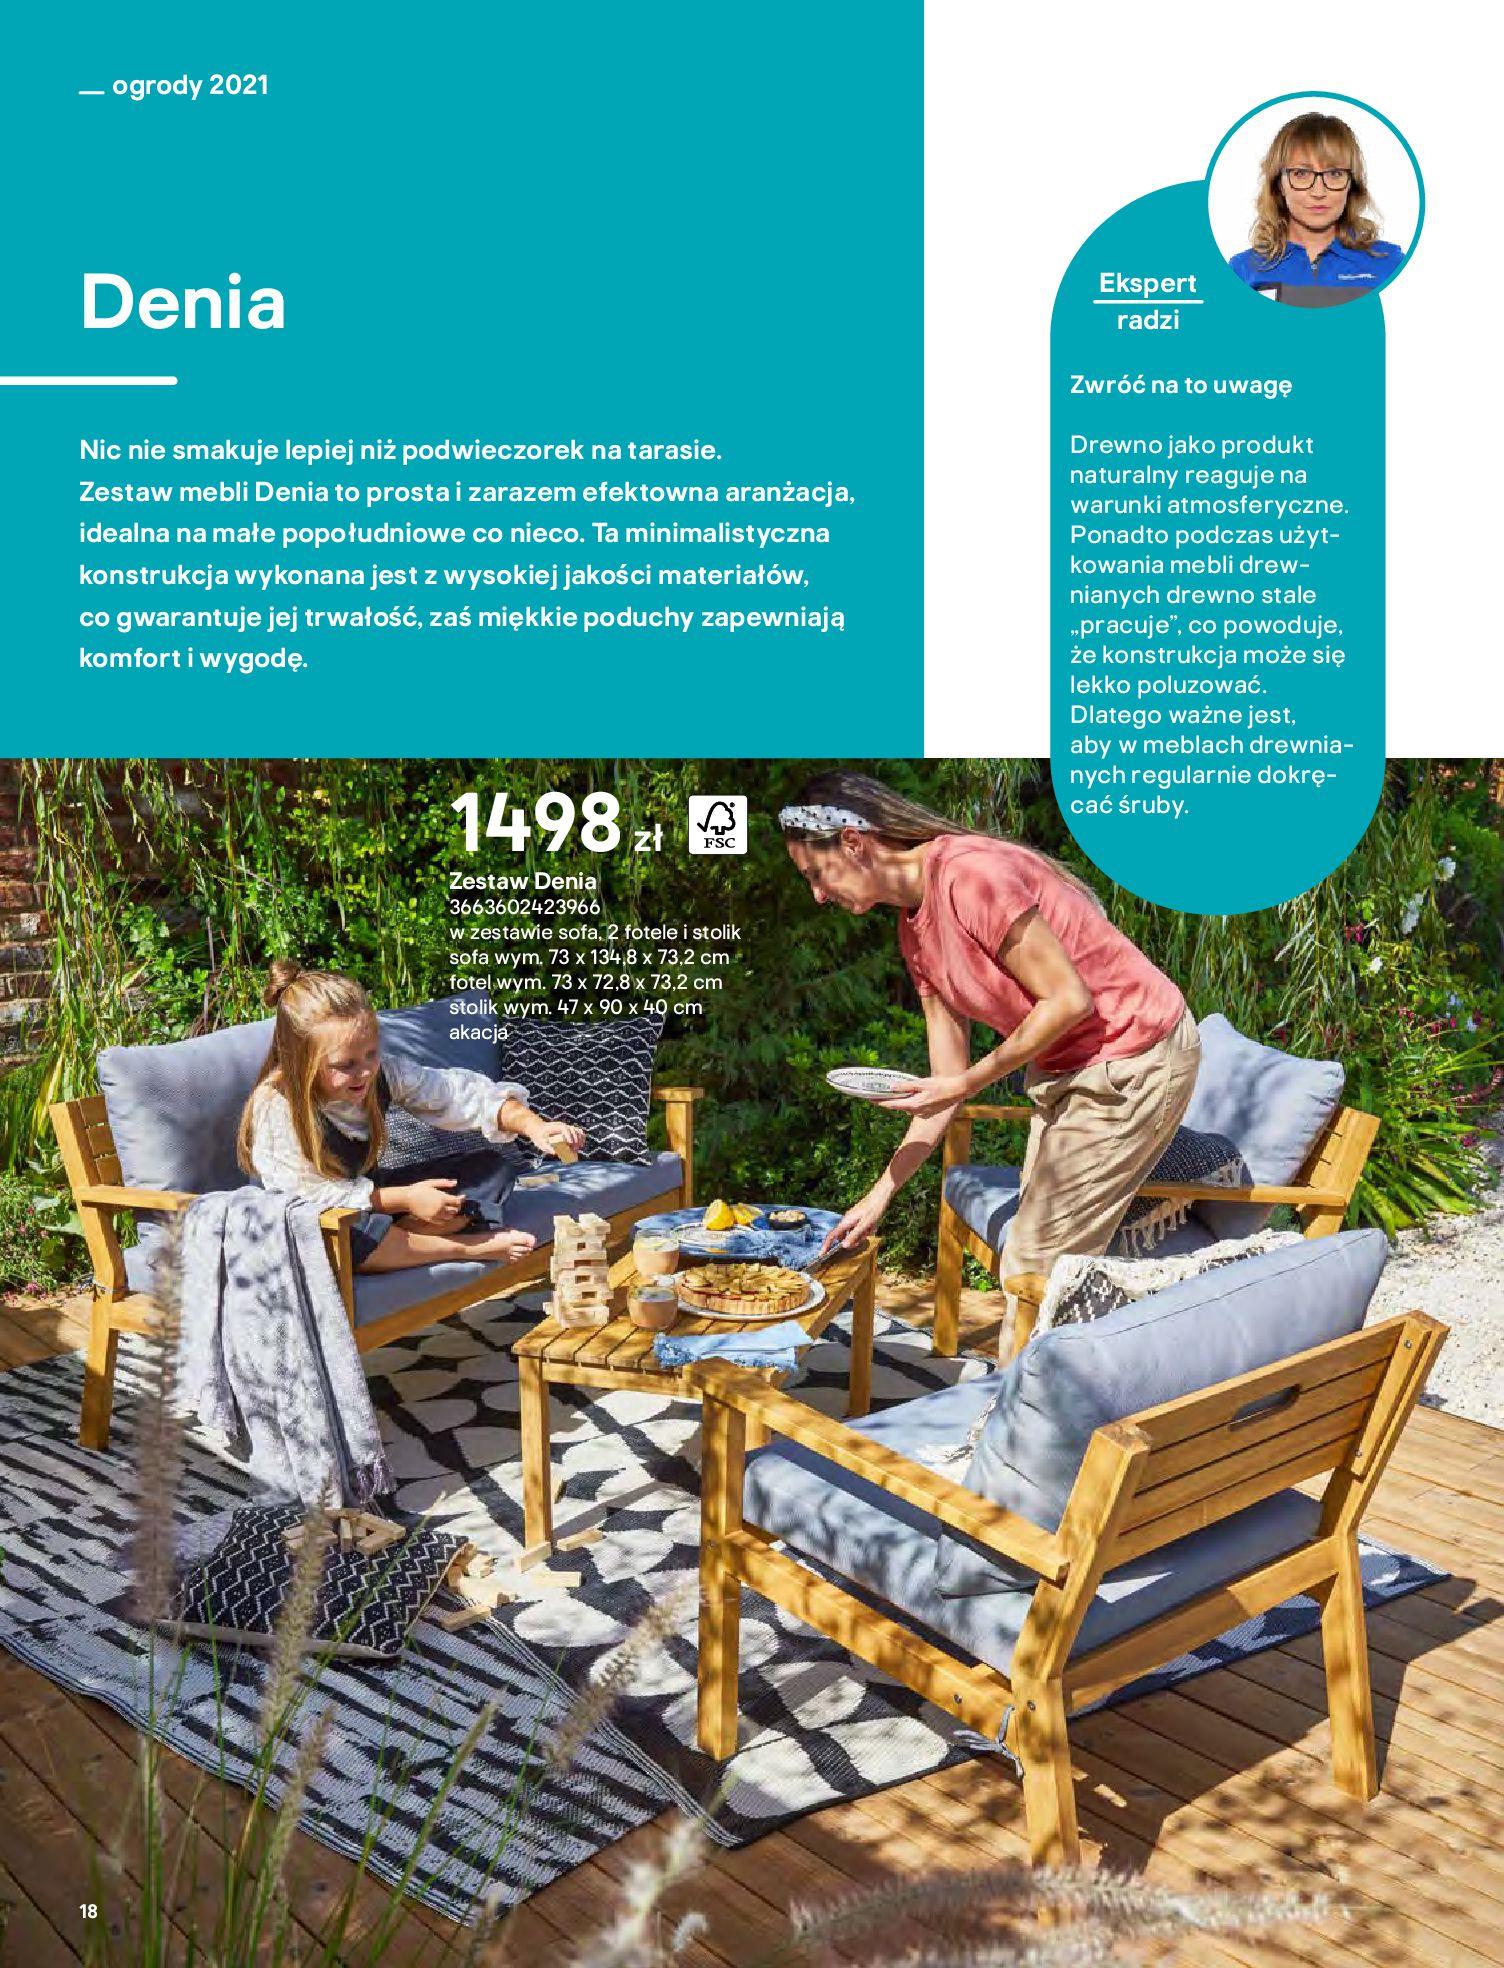 Gazetka Castorama: Katalog ogrody 2021-03-01 page-18